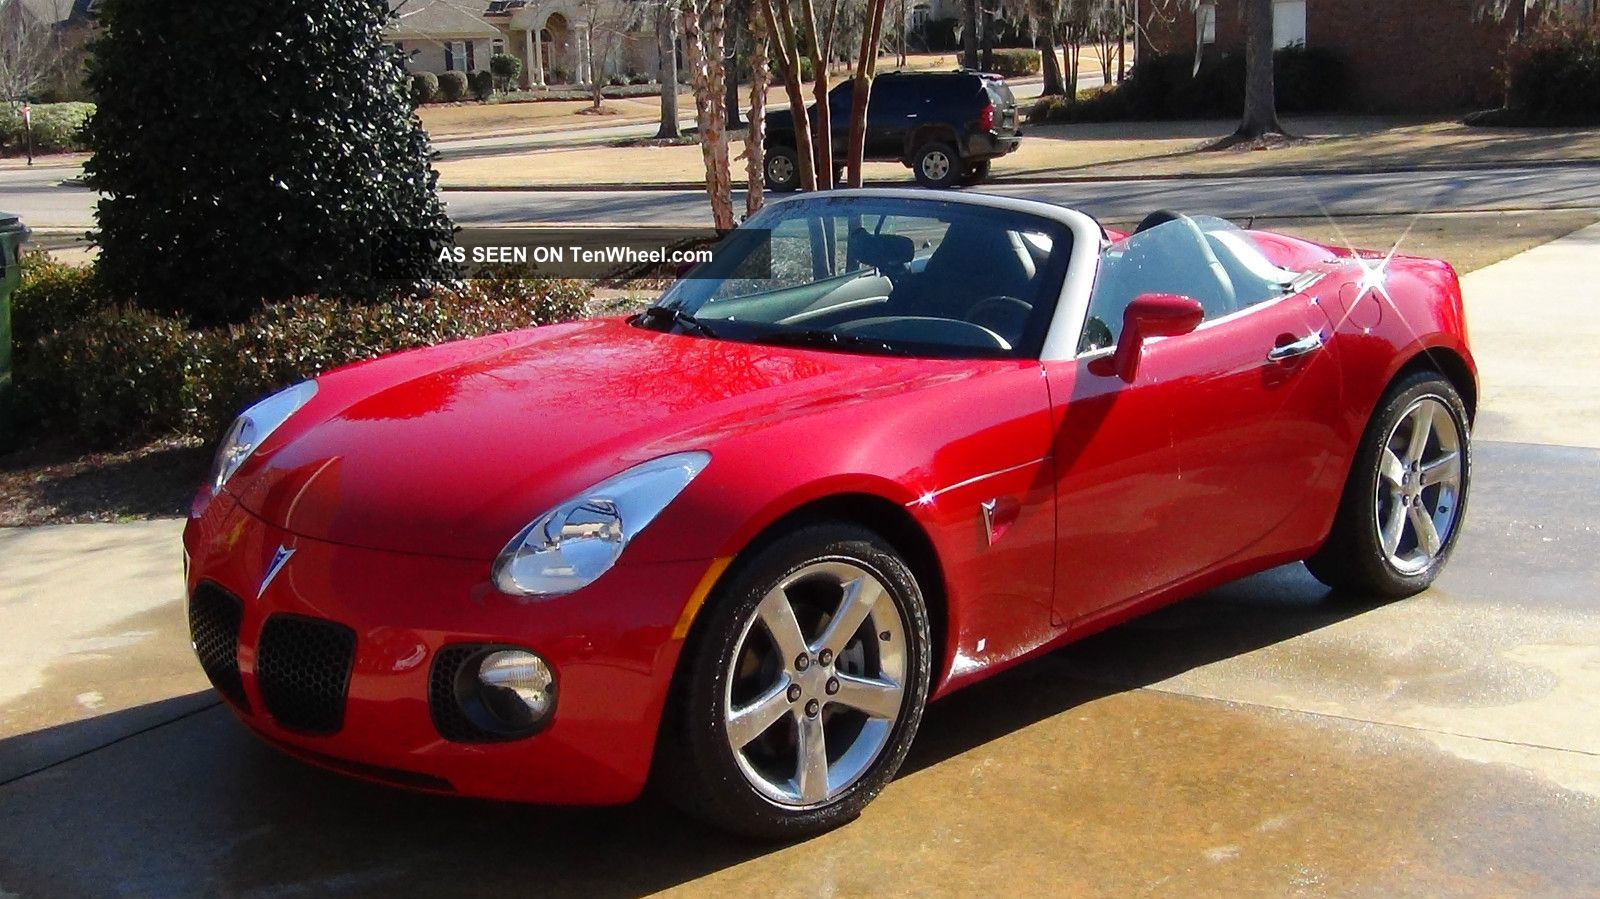 2008 Pontiac Solstice Convertible 2008 Pontiac Solstice